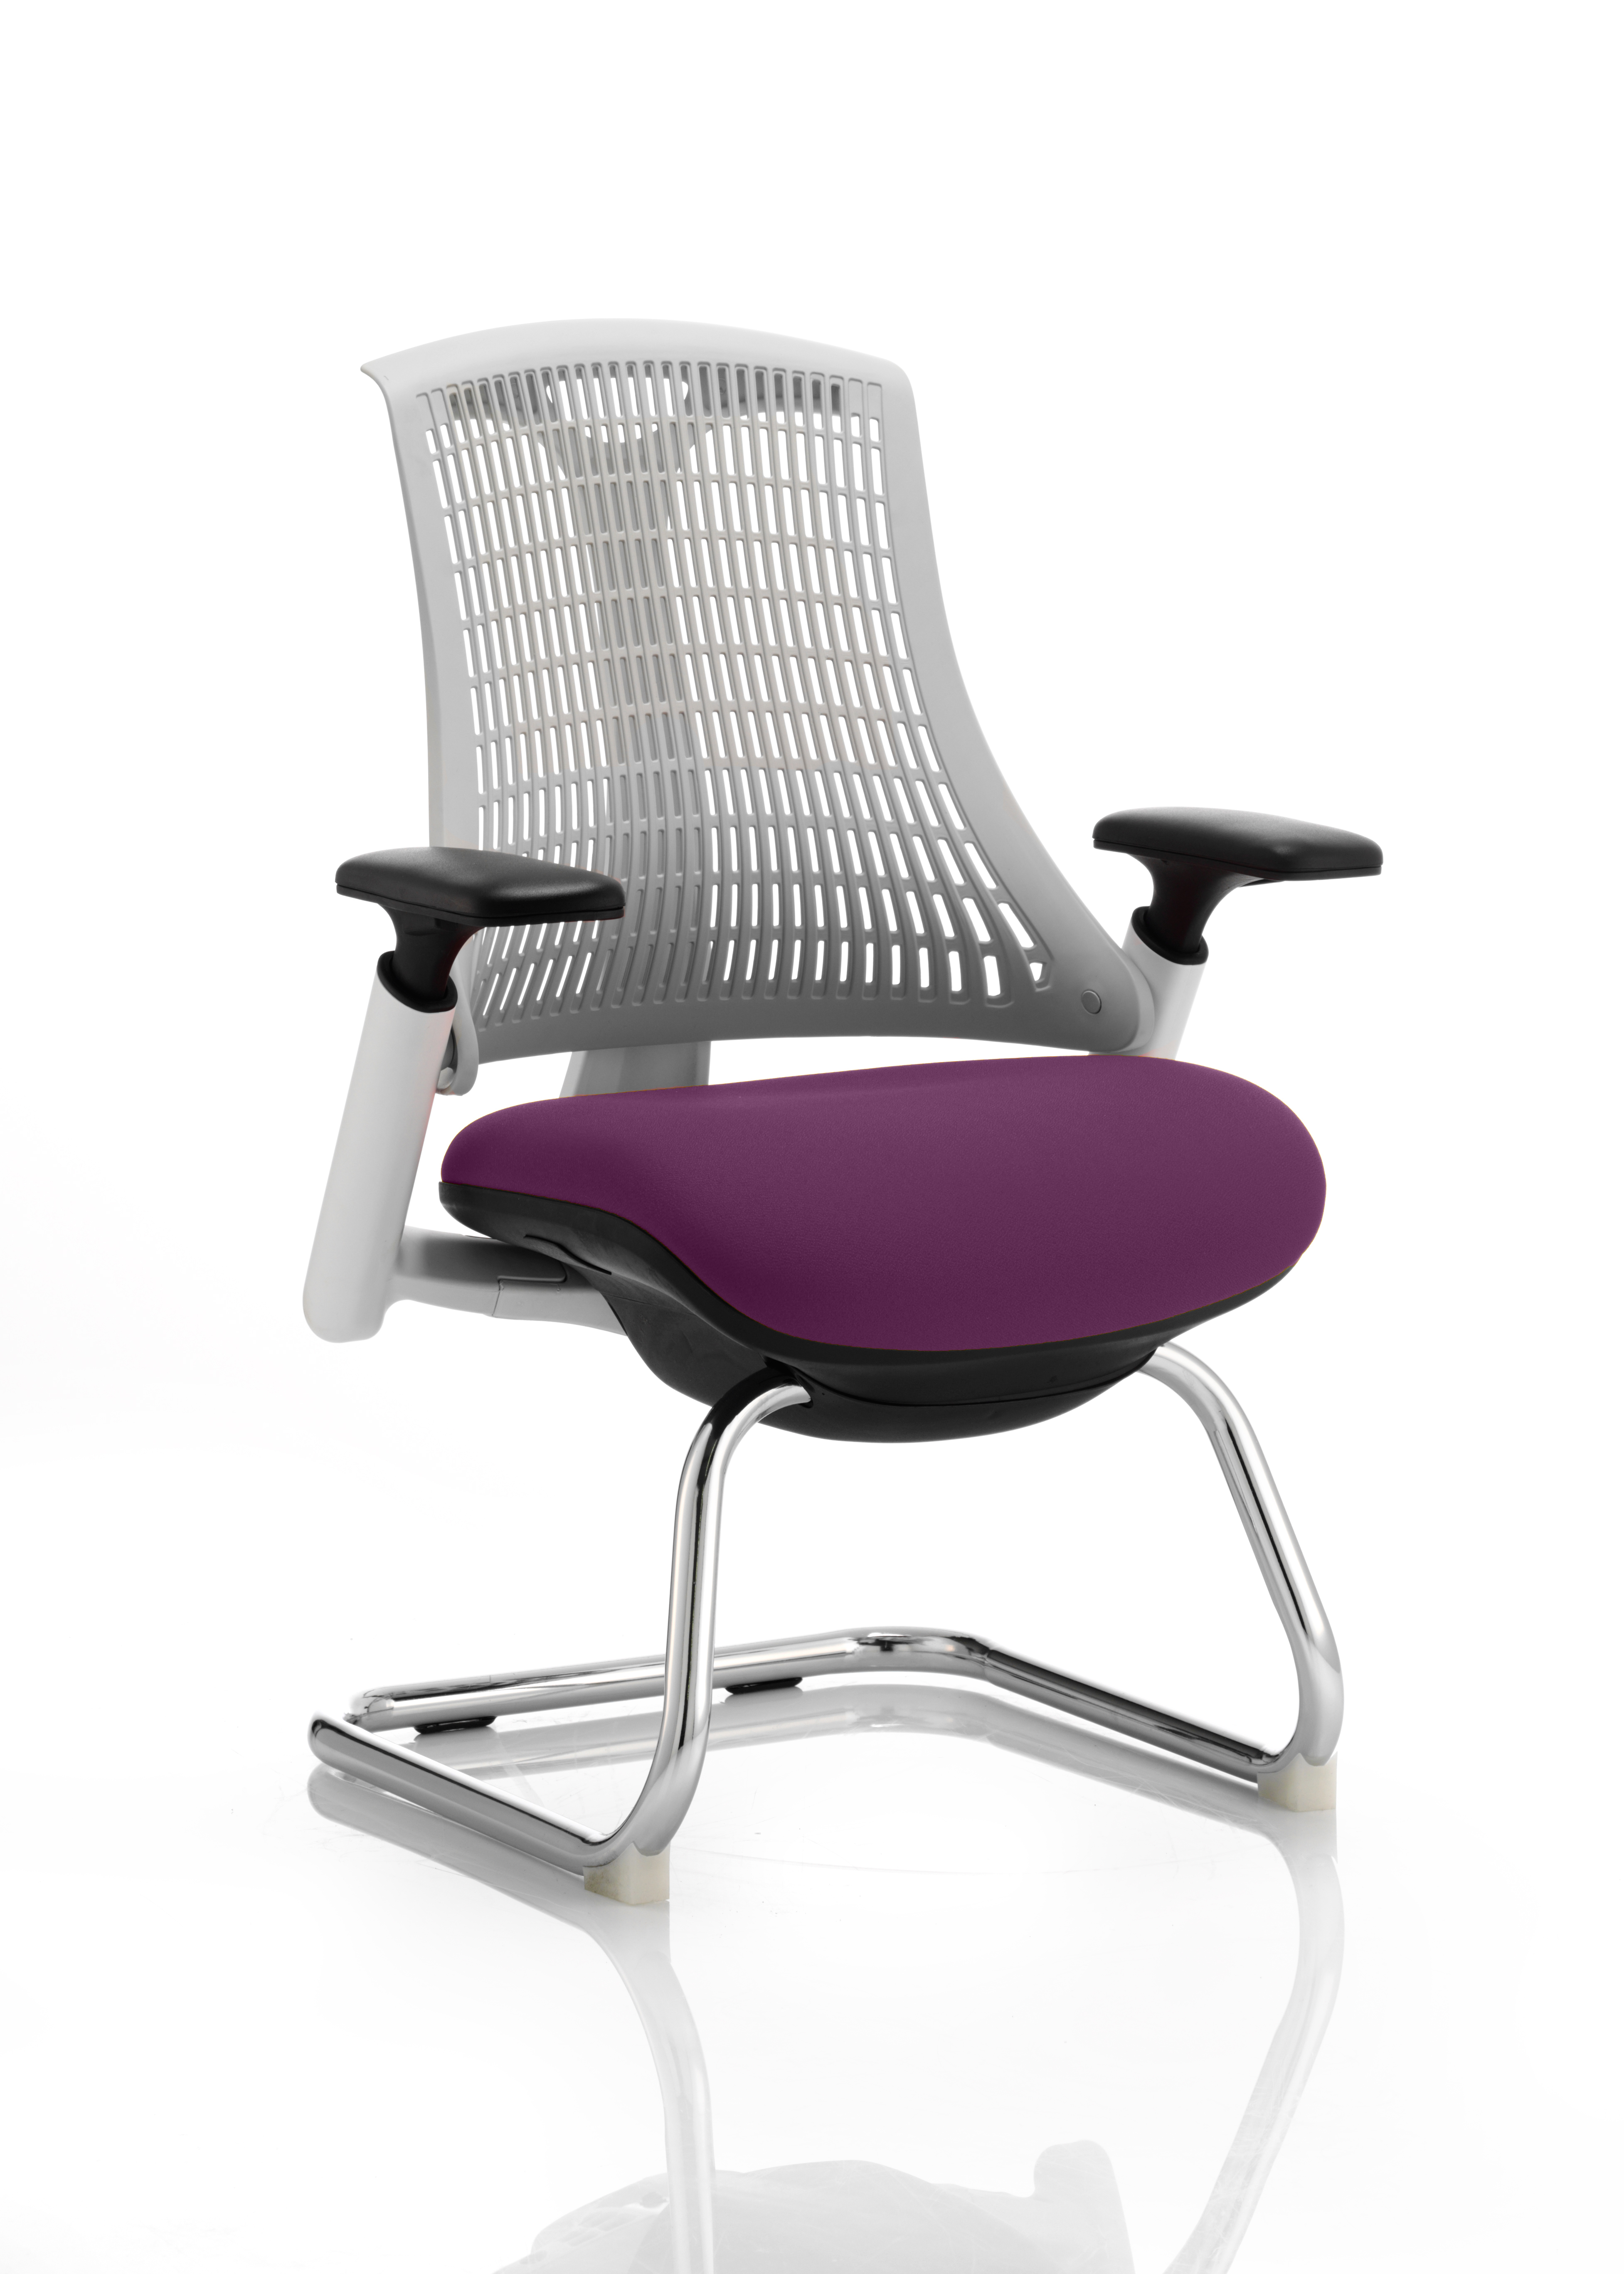 Flex Cantilever Chair White Frame White Back Bespoke Colour Seat Tansy Purple